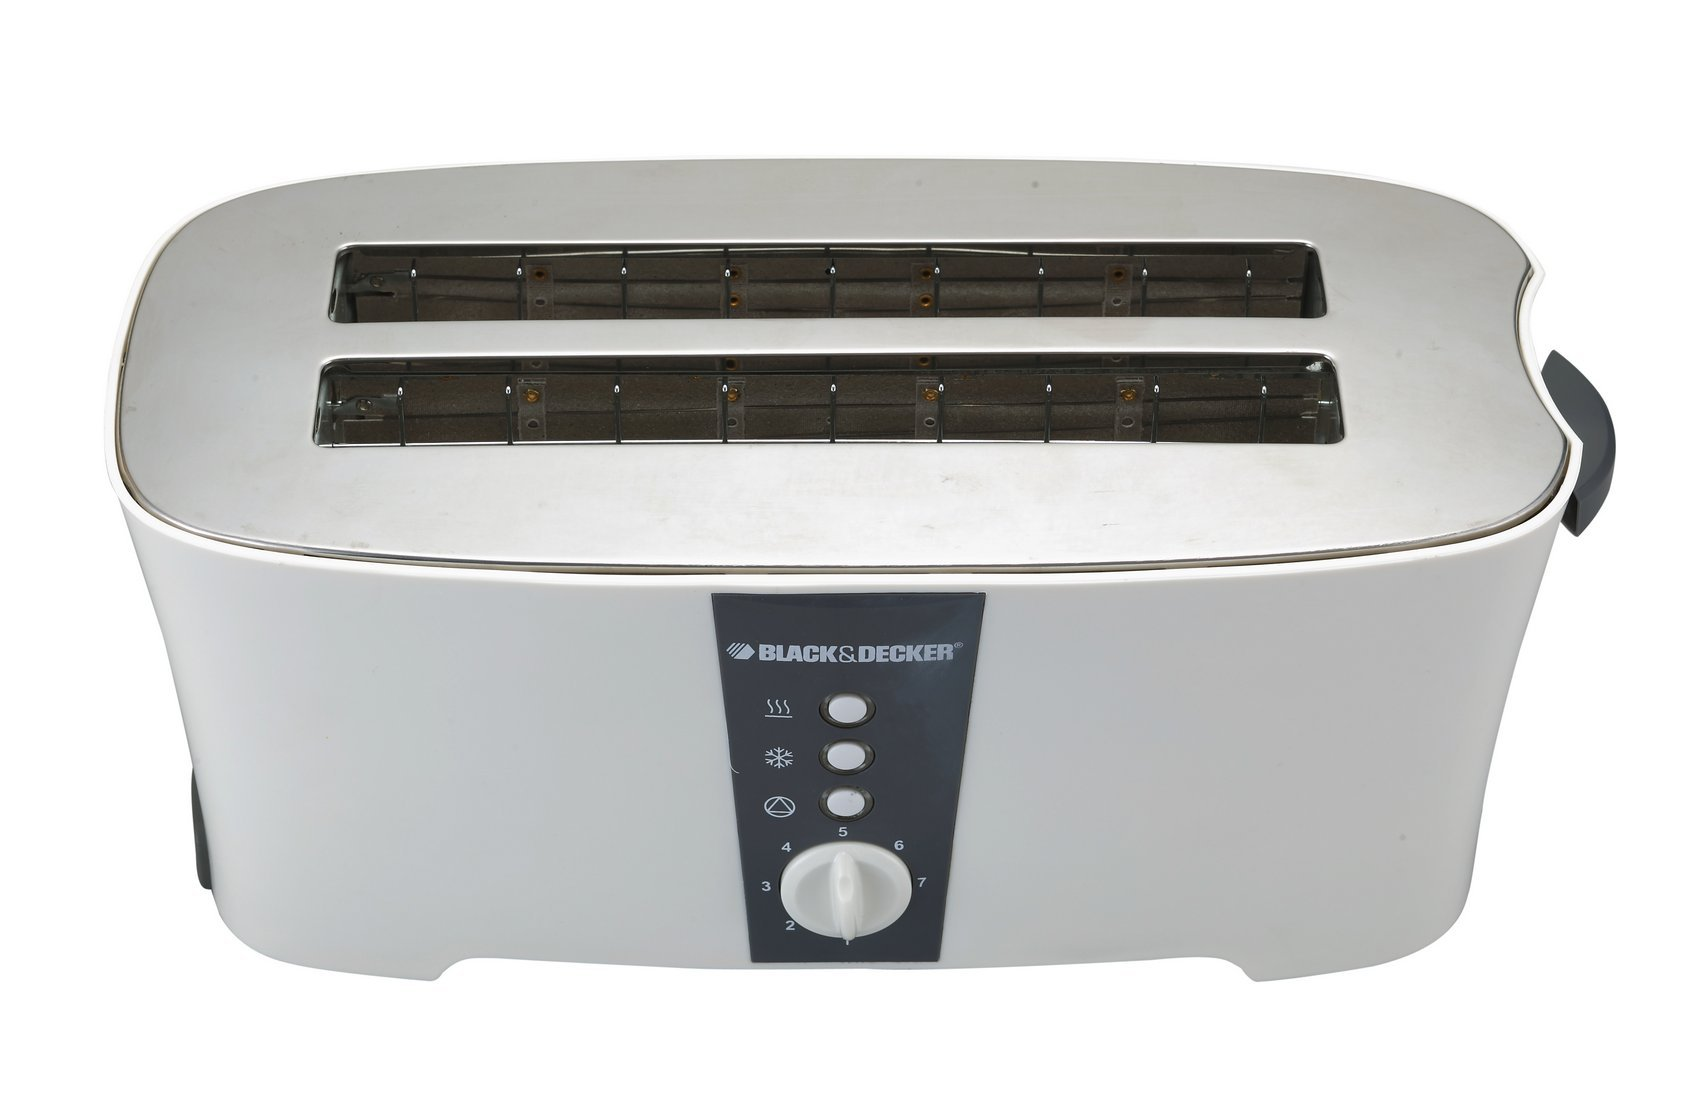 Black & Decker ET124 1350W 4-Slice Toaster (Non-USA Compliant), White by BLACK+DECKER (Image #2)